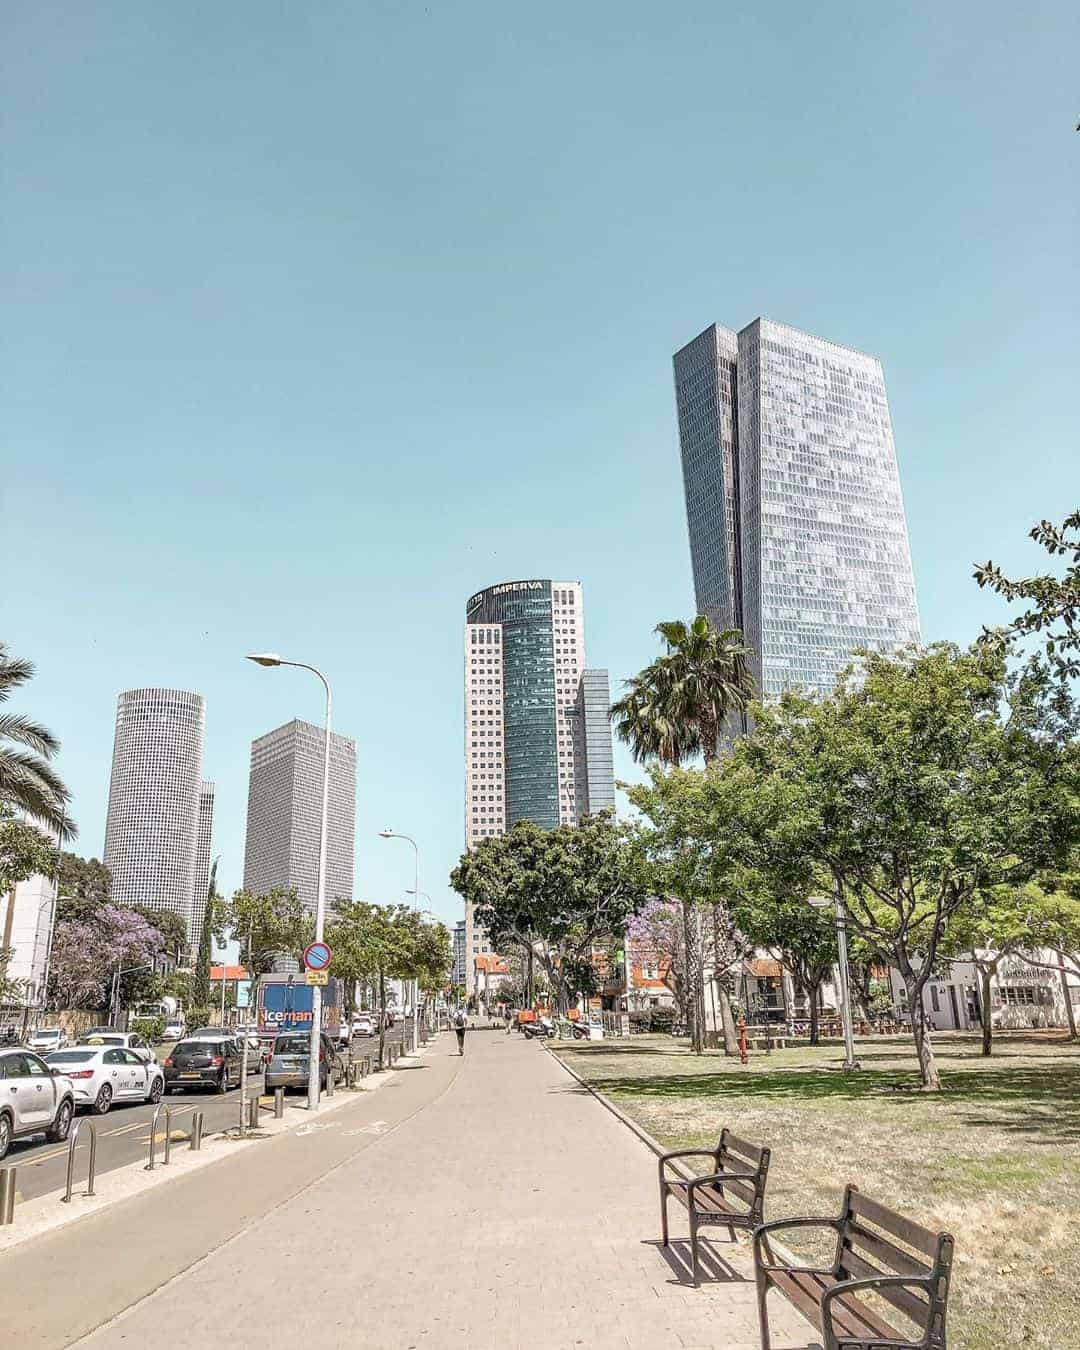 Israel travel itinerary: Tel Aviv